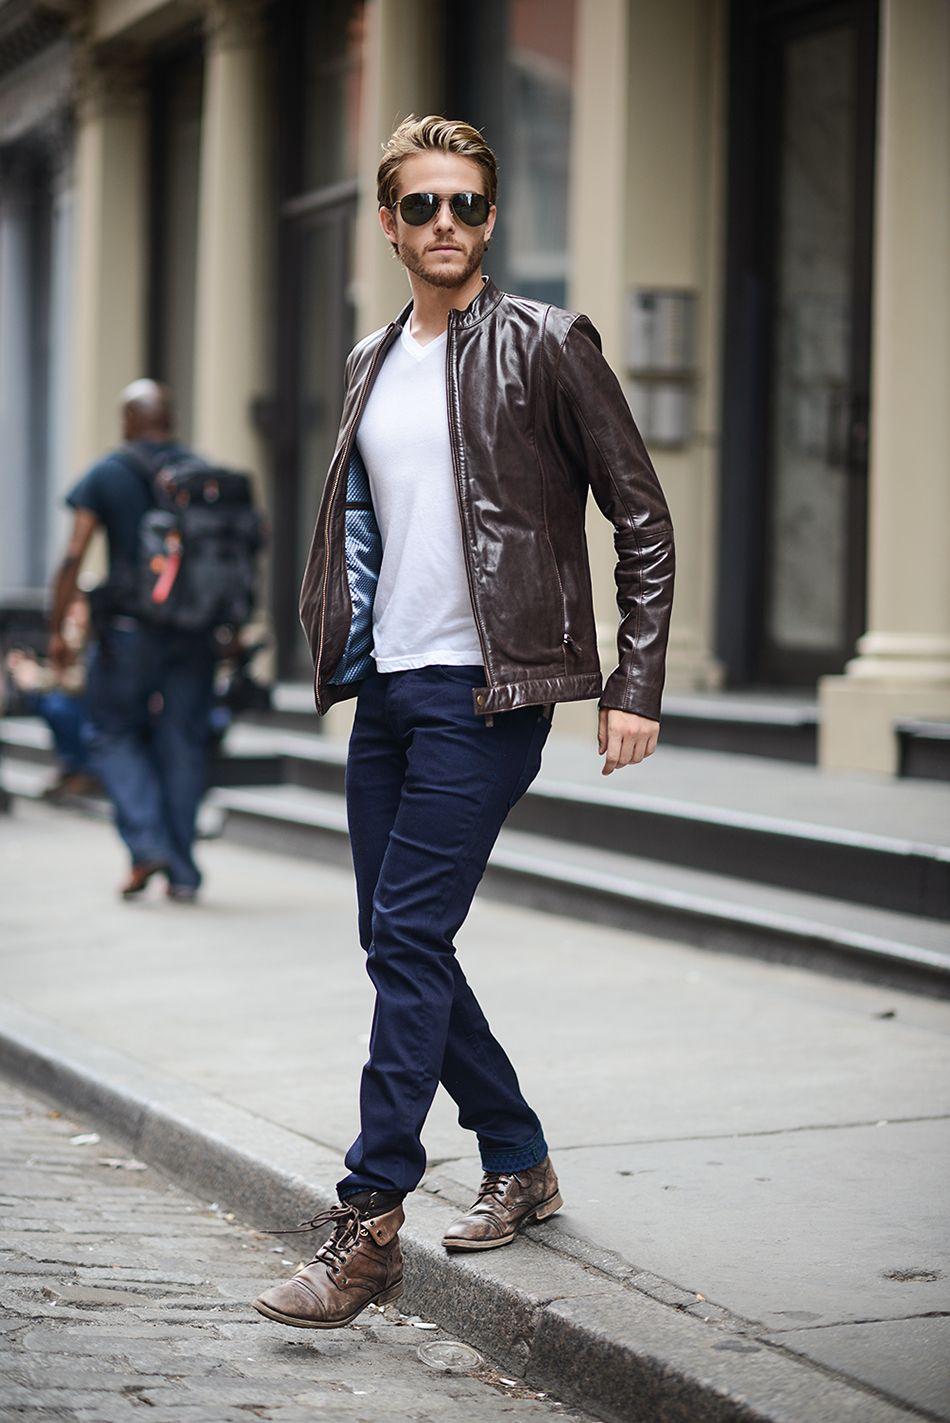 Men's Fashion Instagram Page Leather jacket brands